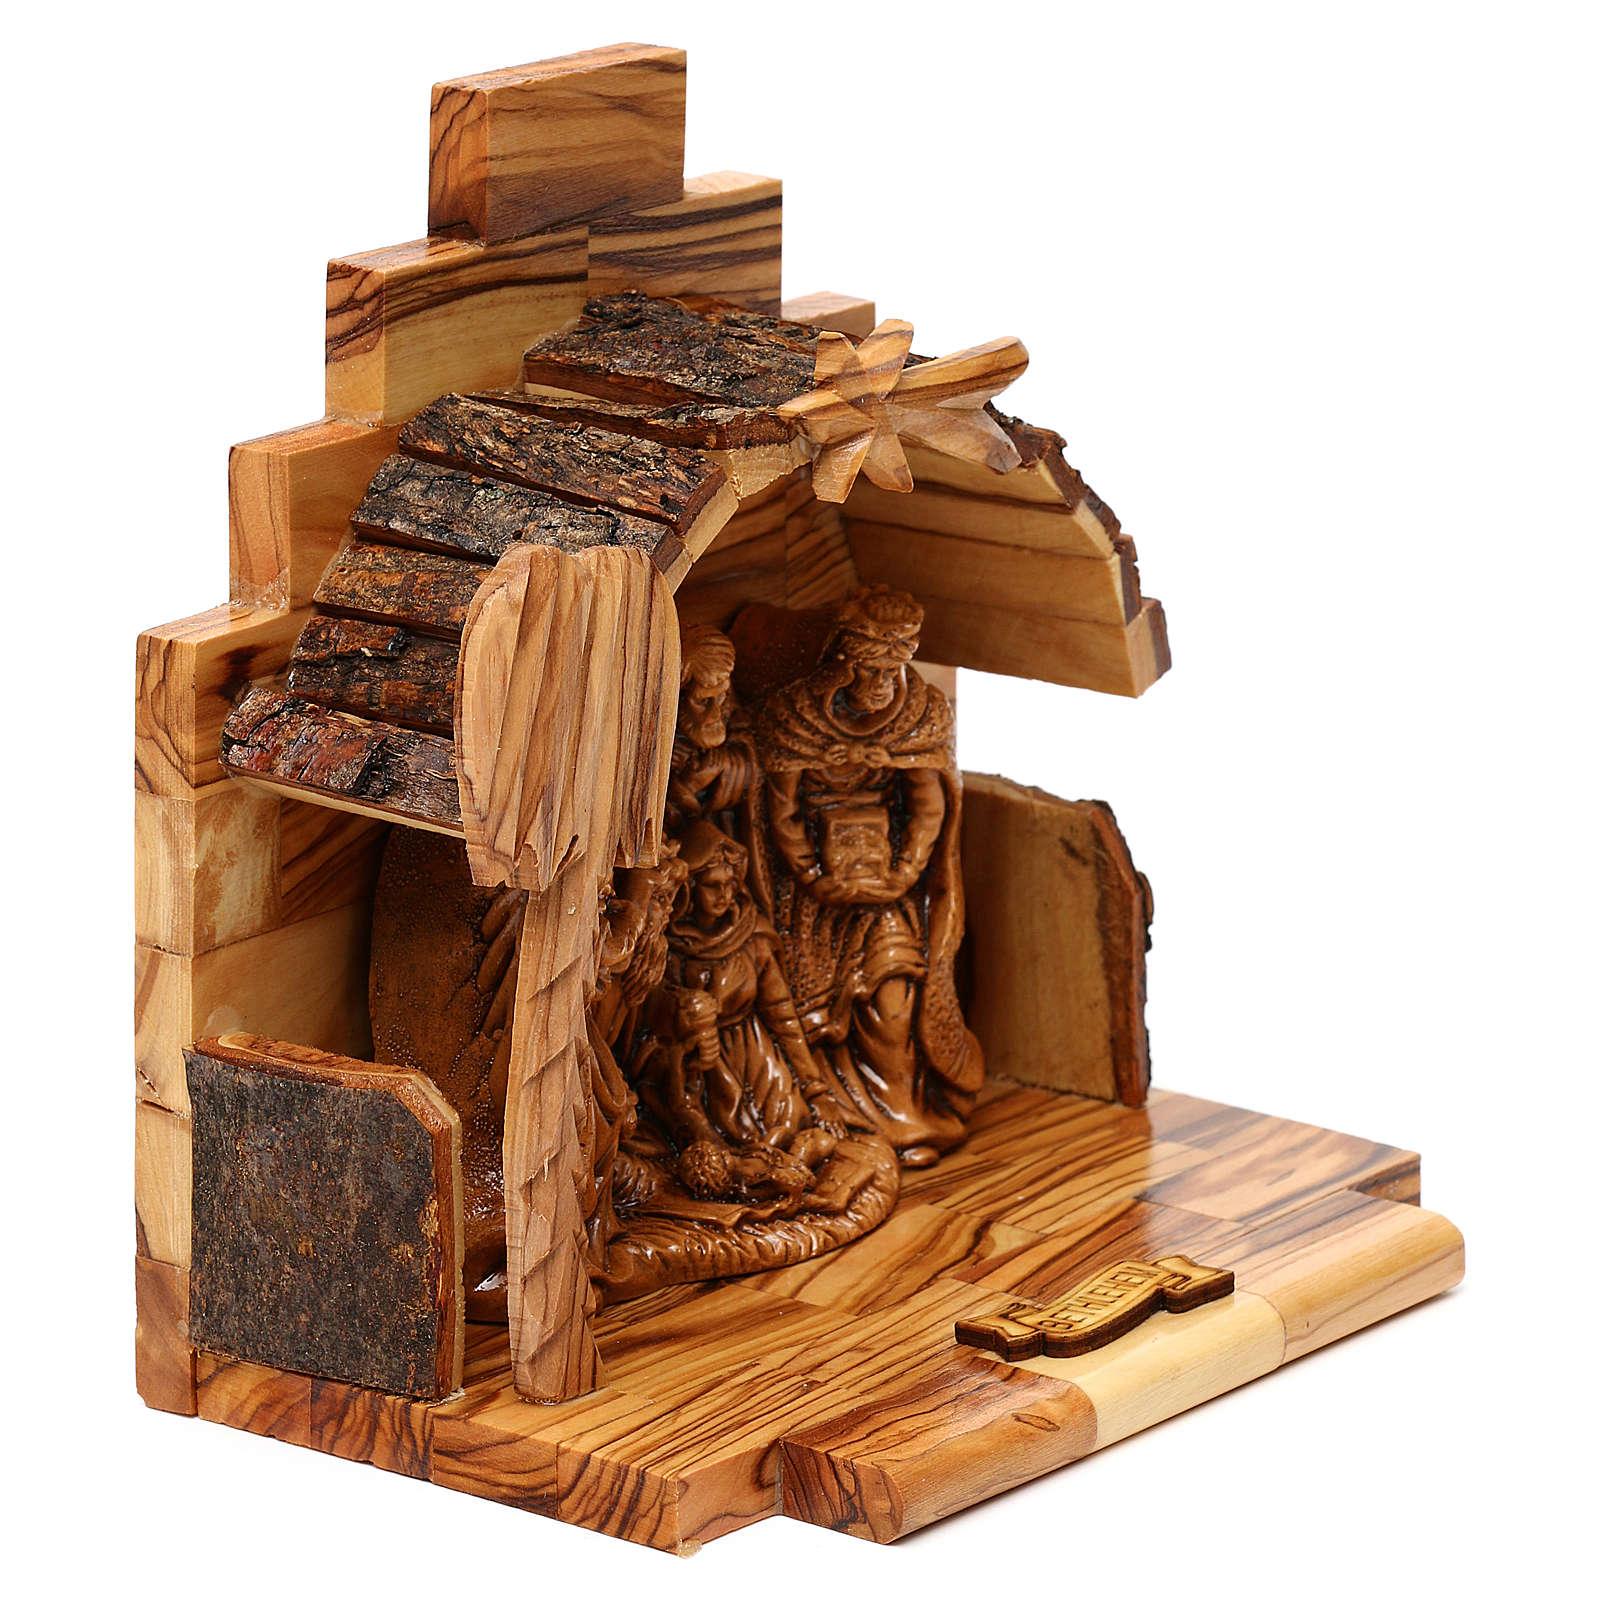 Nativity scene in plaster with stable in Bethlehem olive wood 15x15x10 cm 4